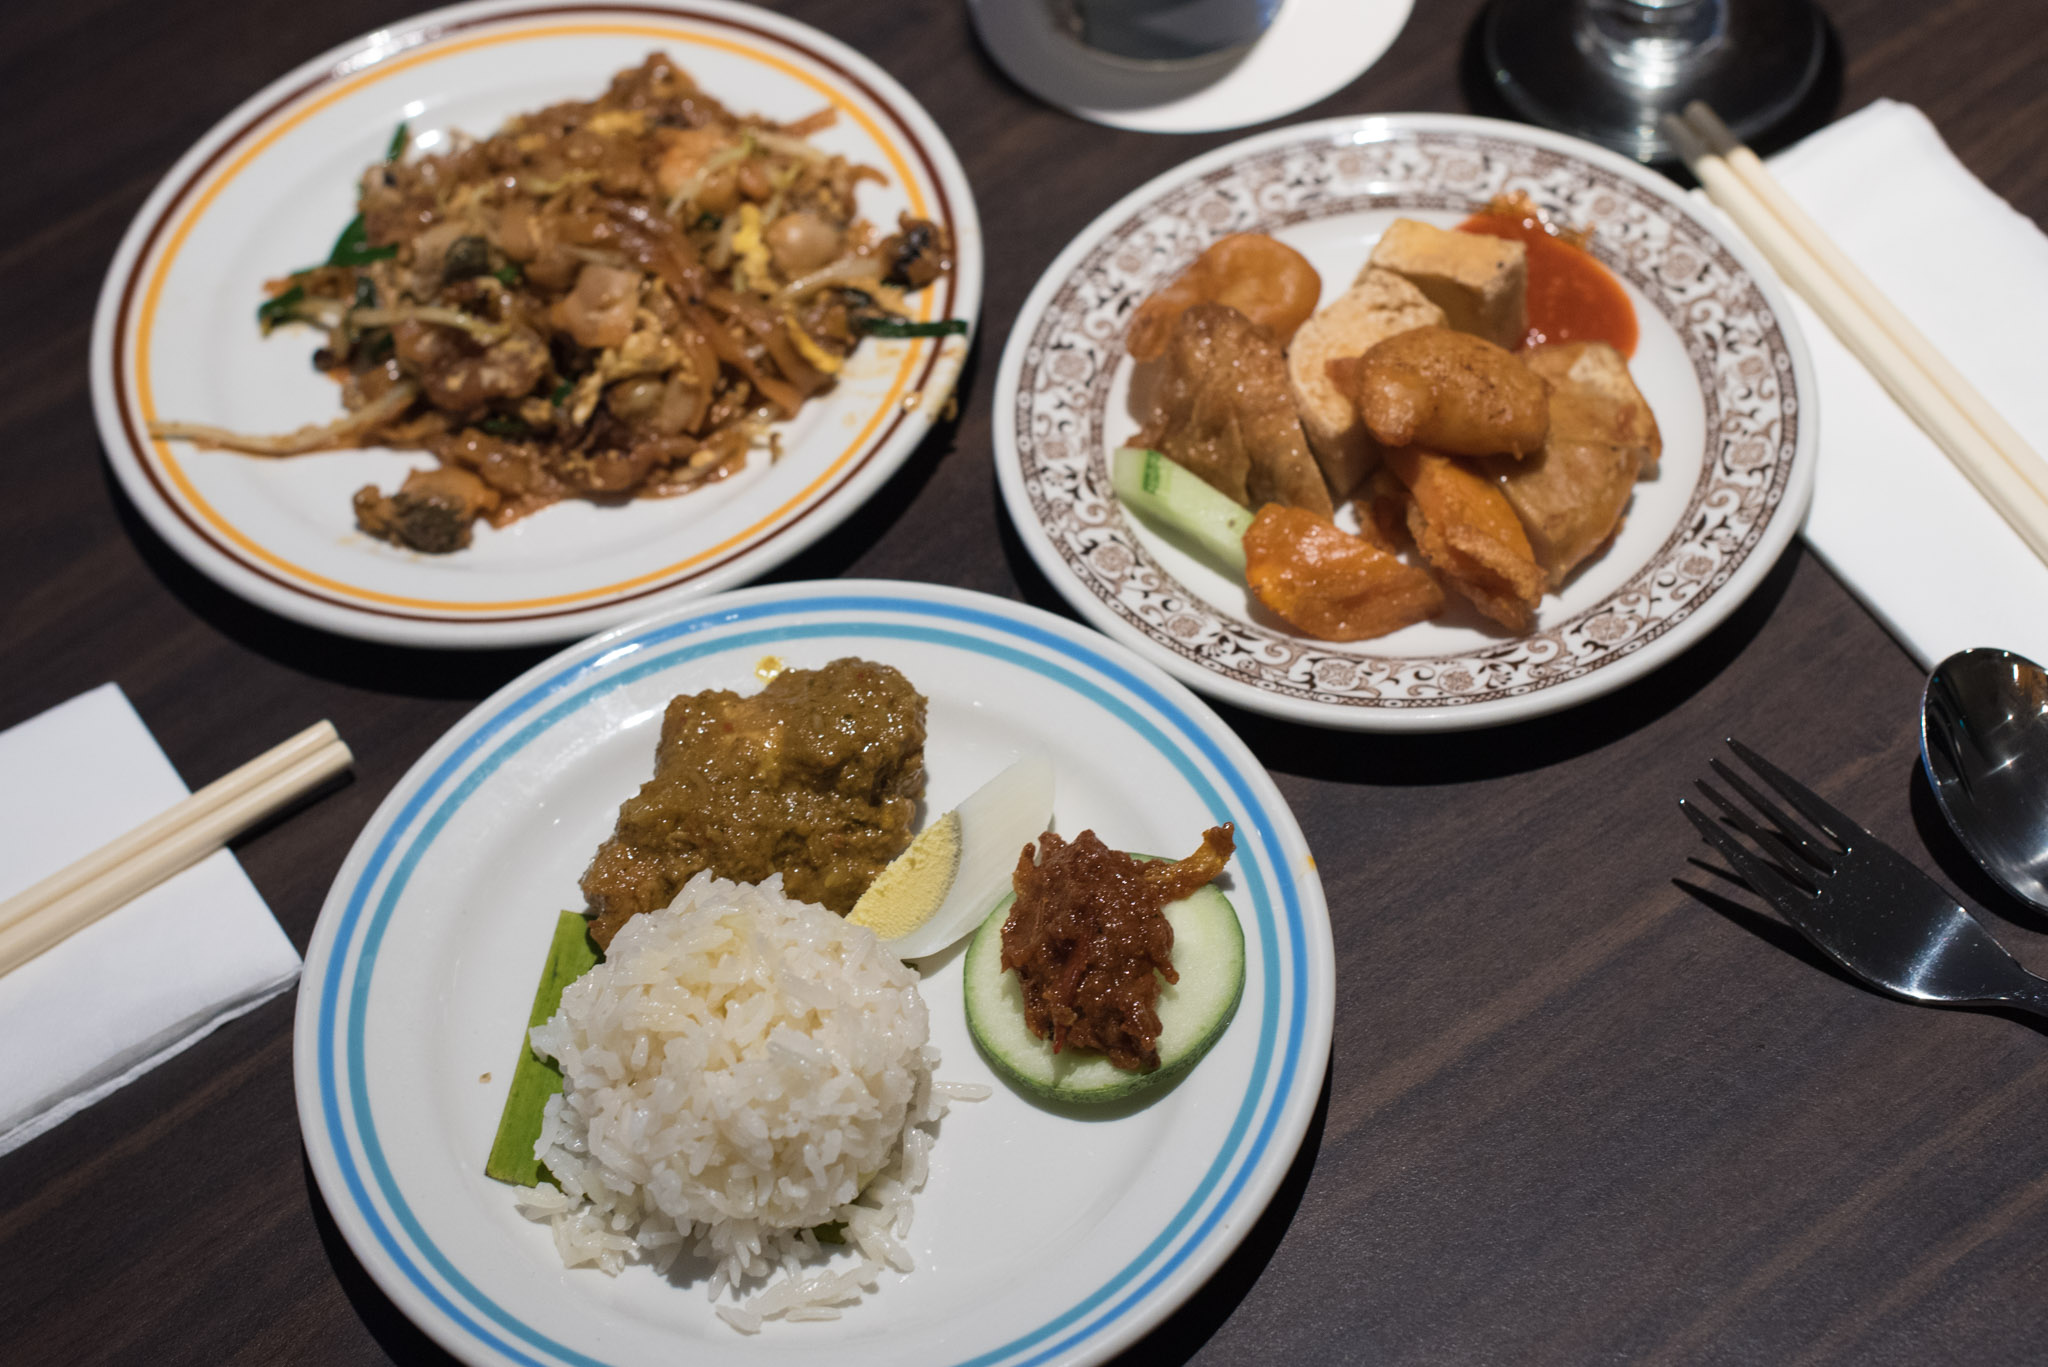 Clockwise from Top Left: Char Kway Teow, Lok Bak, Nasi Lemak with Nonya Chicken Kapitan Penang Hawkers' Fare - York Hotel